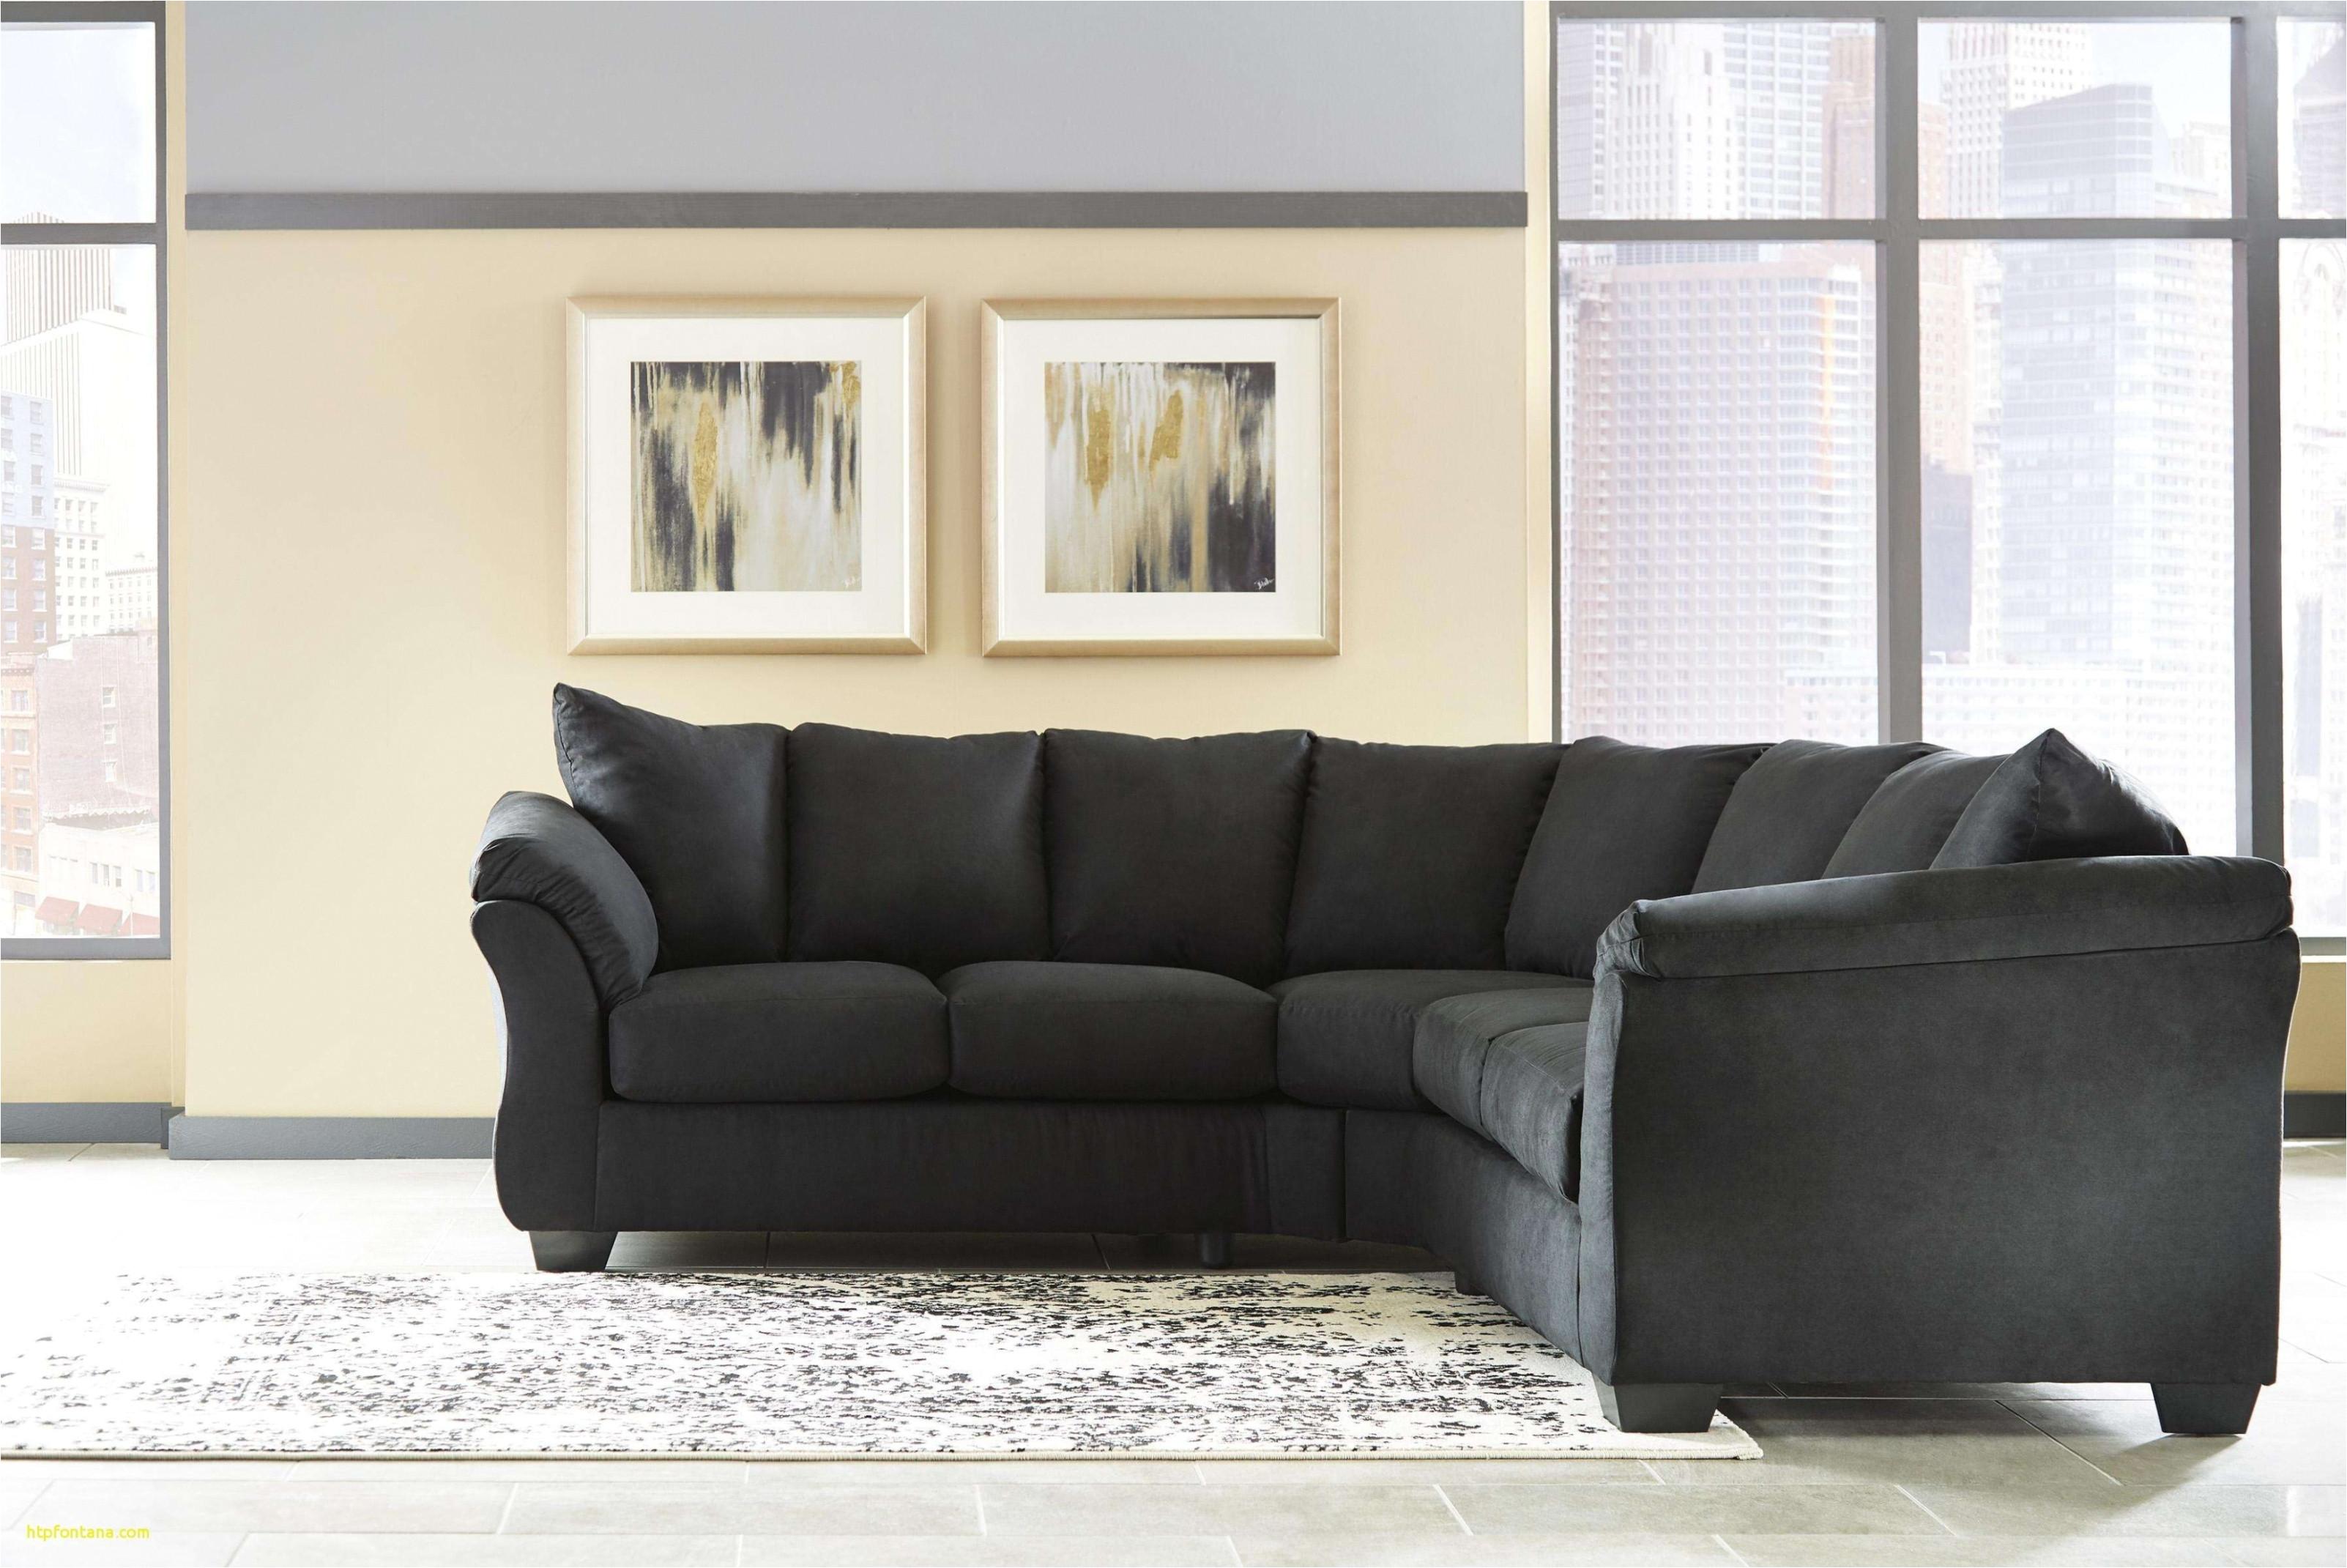 image de couch and sofa luxury kinderzimmer couch mit einzigartig sofa de 0d